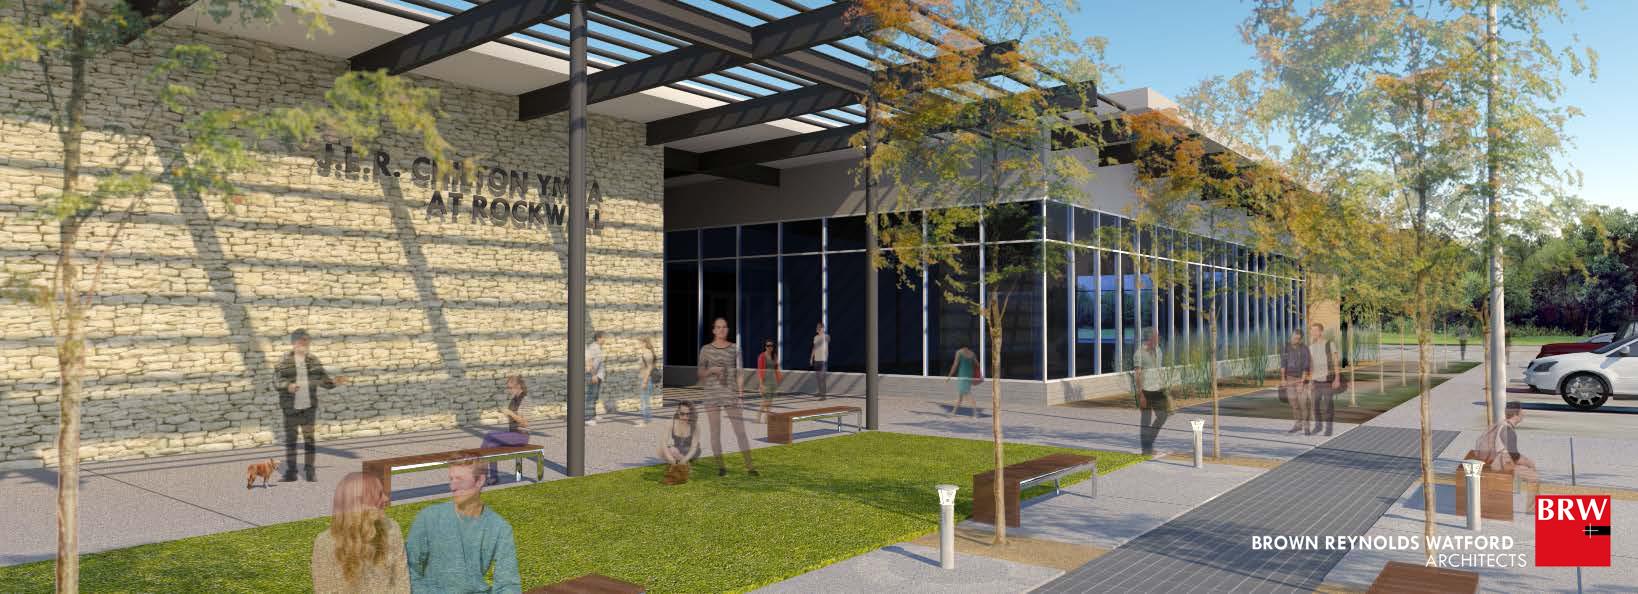 JER CHILTON rendering Plaza_SD